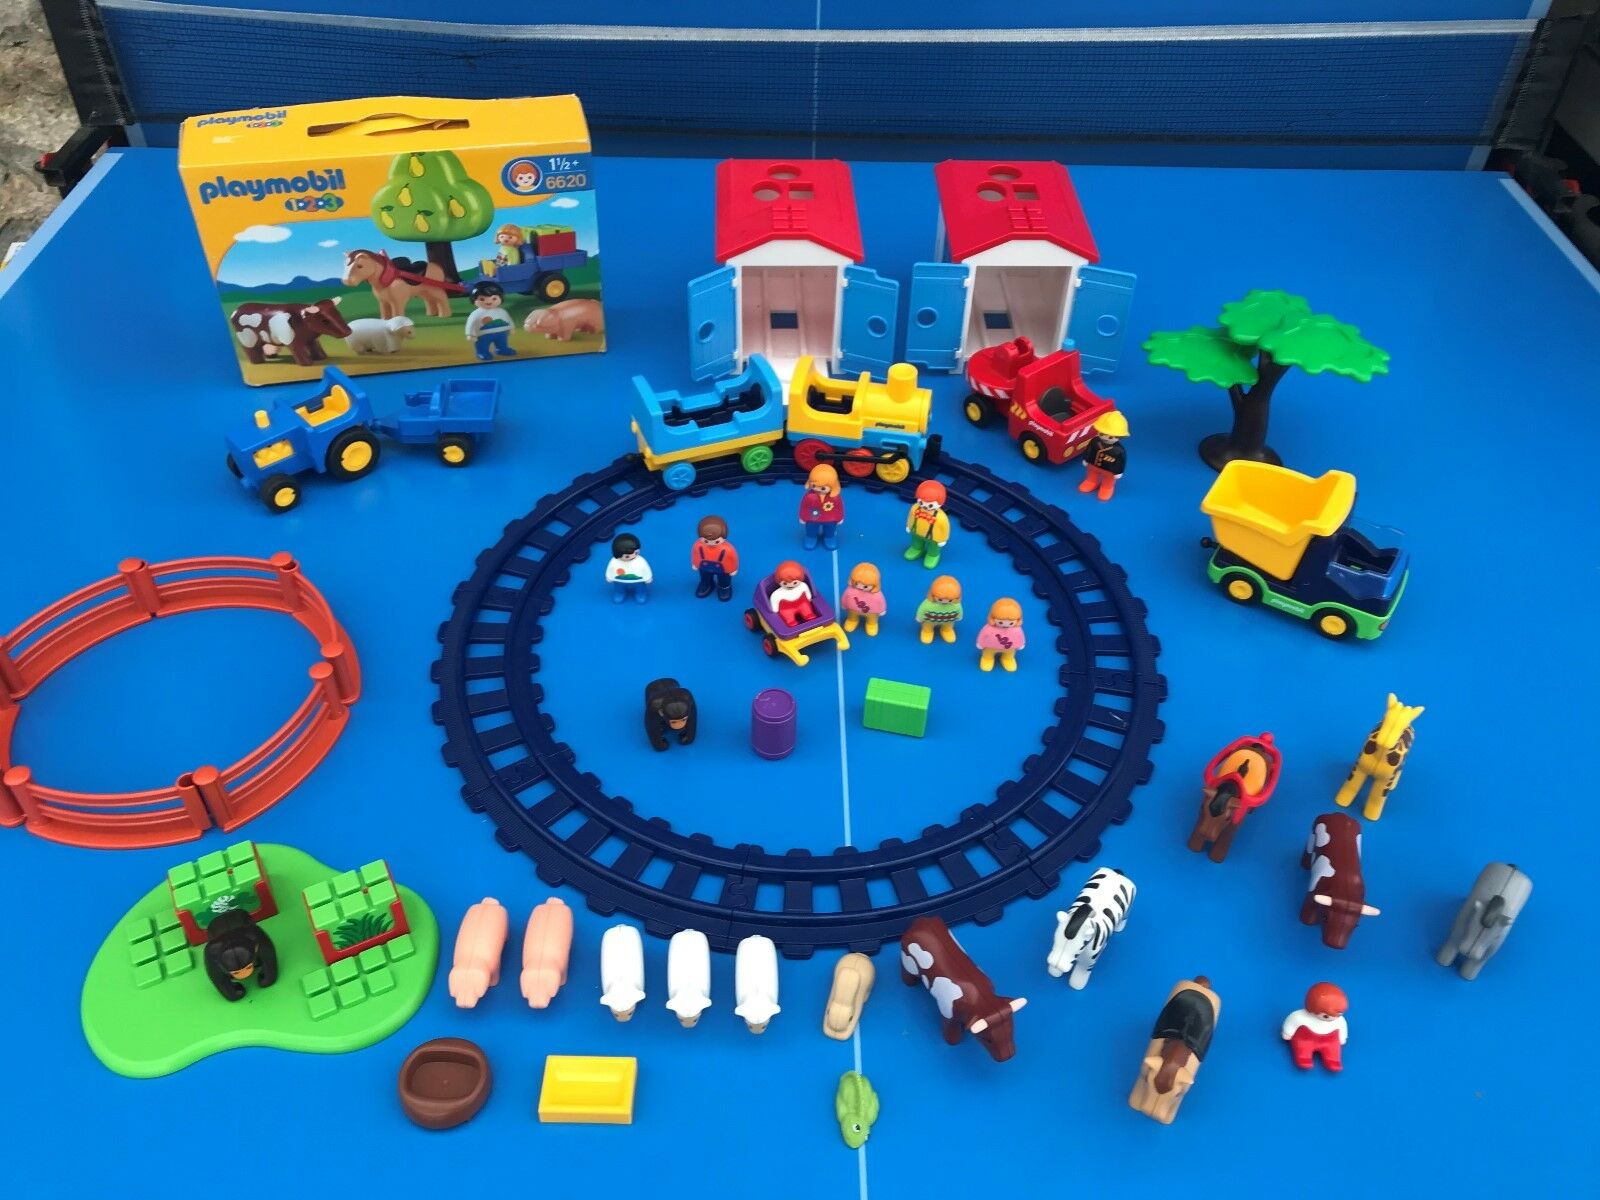 Playmobil 123 enorme lot tbe kg farm zoo animals Fahrzeuge train figurines no 2